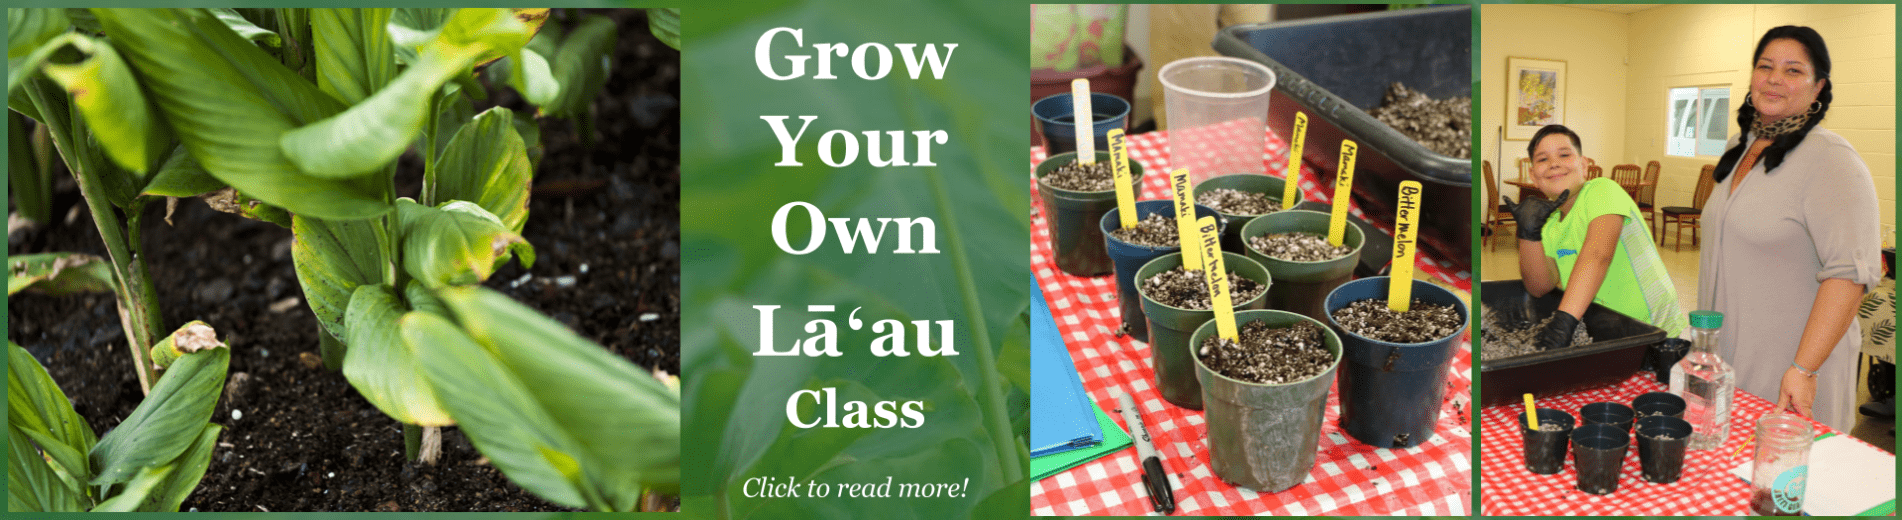 Grow Your Own Laau Class